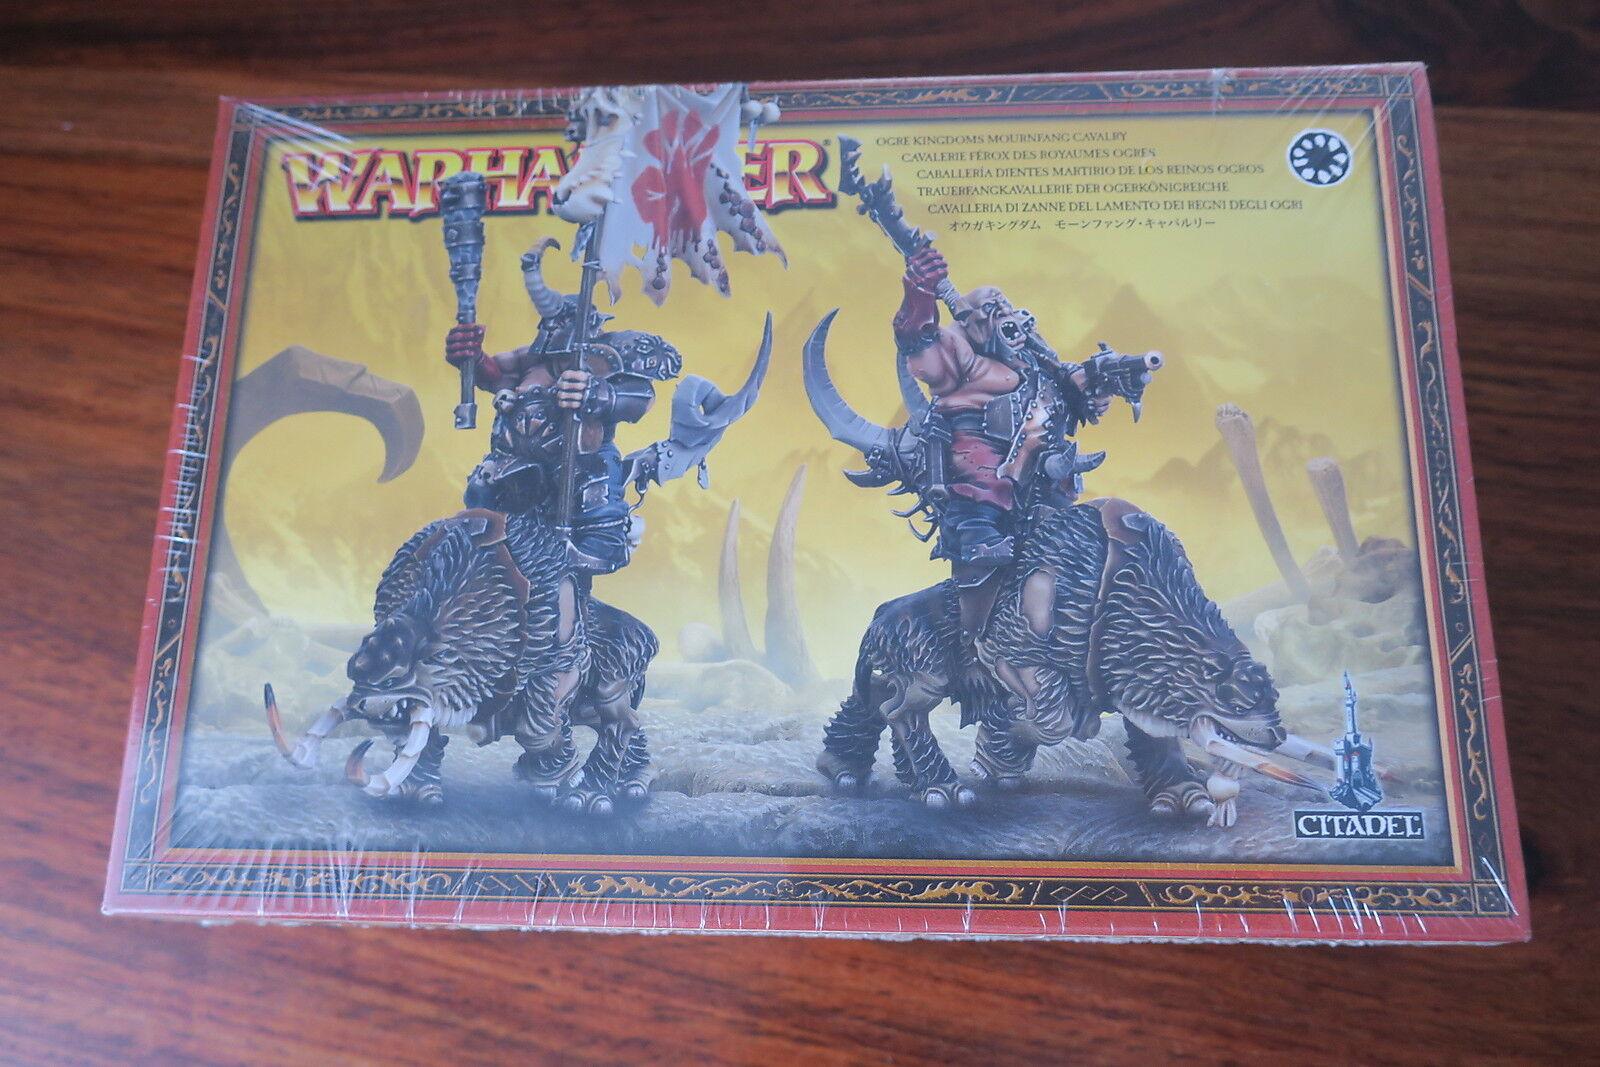 Warhammer Caballería Ferox de las Reinos Ogro   Ogro Kingdoms Mournfang Cavalry